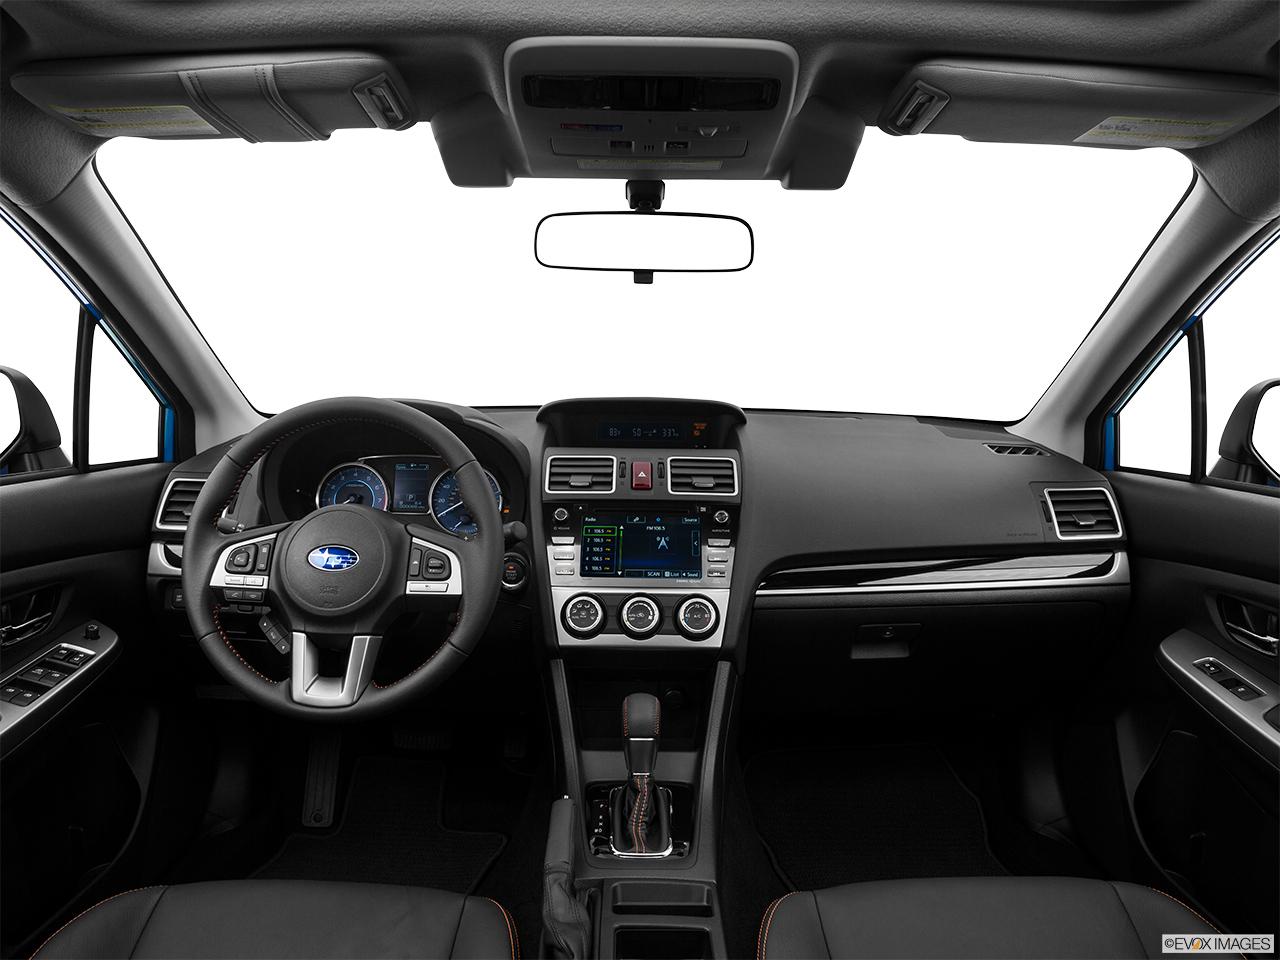 subaru xv 2017 2 0l premium in uae new car prices specs reviews photos yallamotor. Black Bedroom Furniture Sets. Home Design Ideas